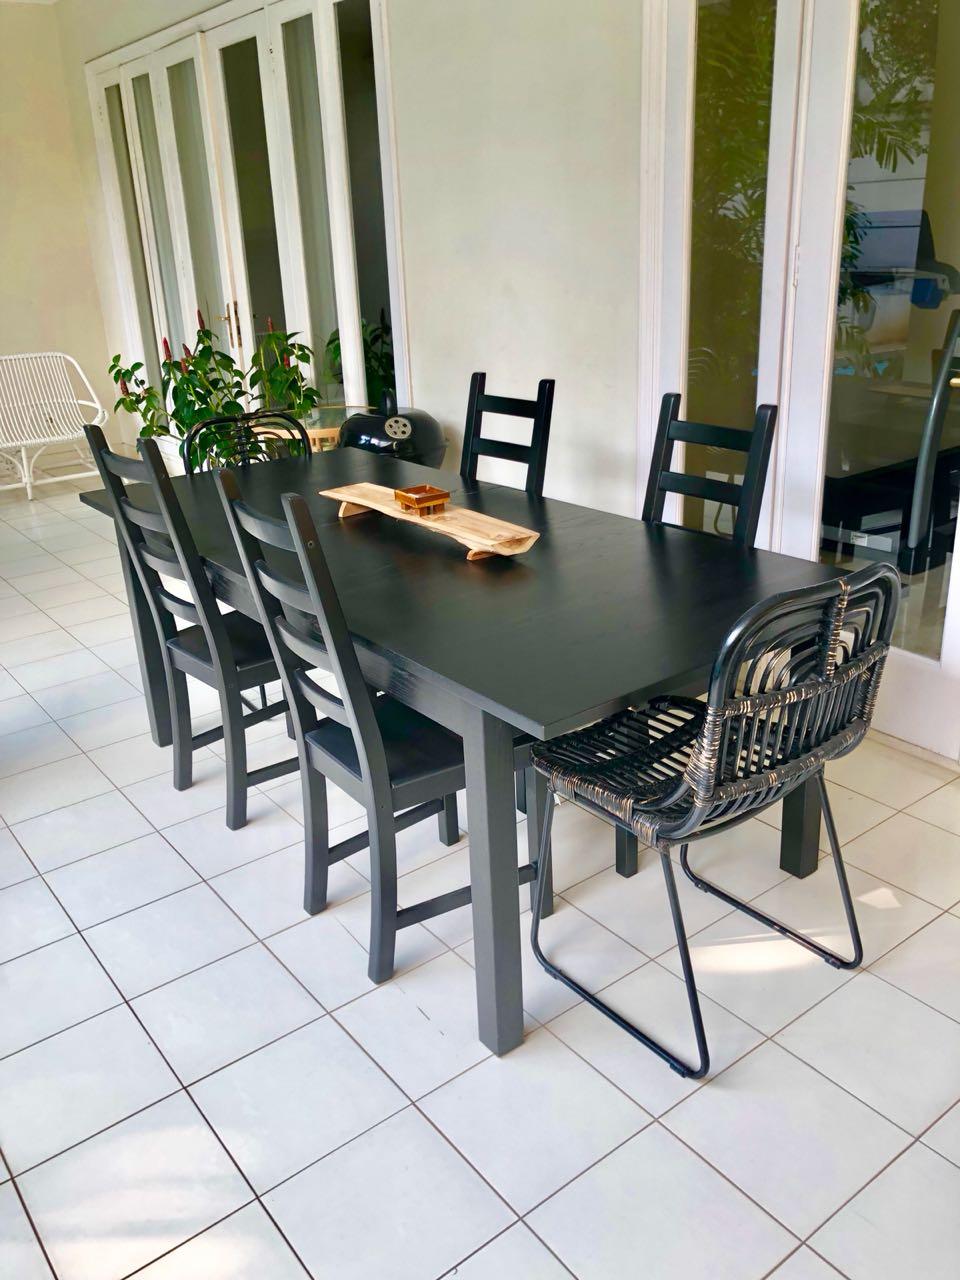 4 Kaustby Ikea Chairs